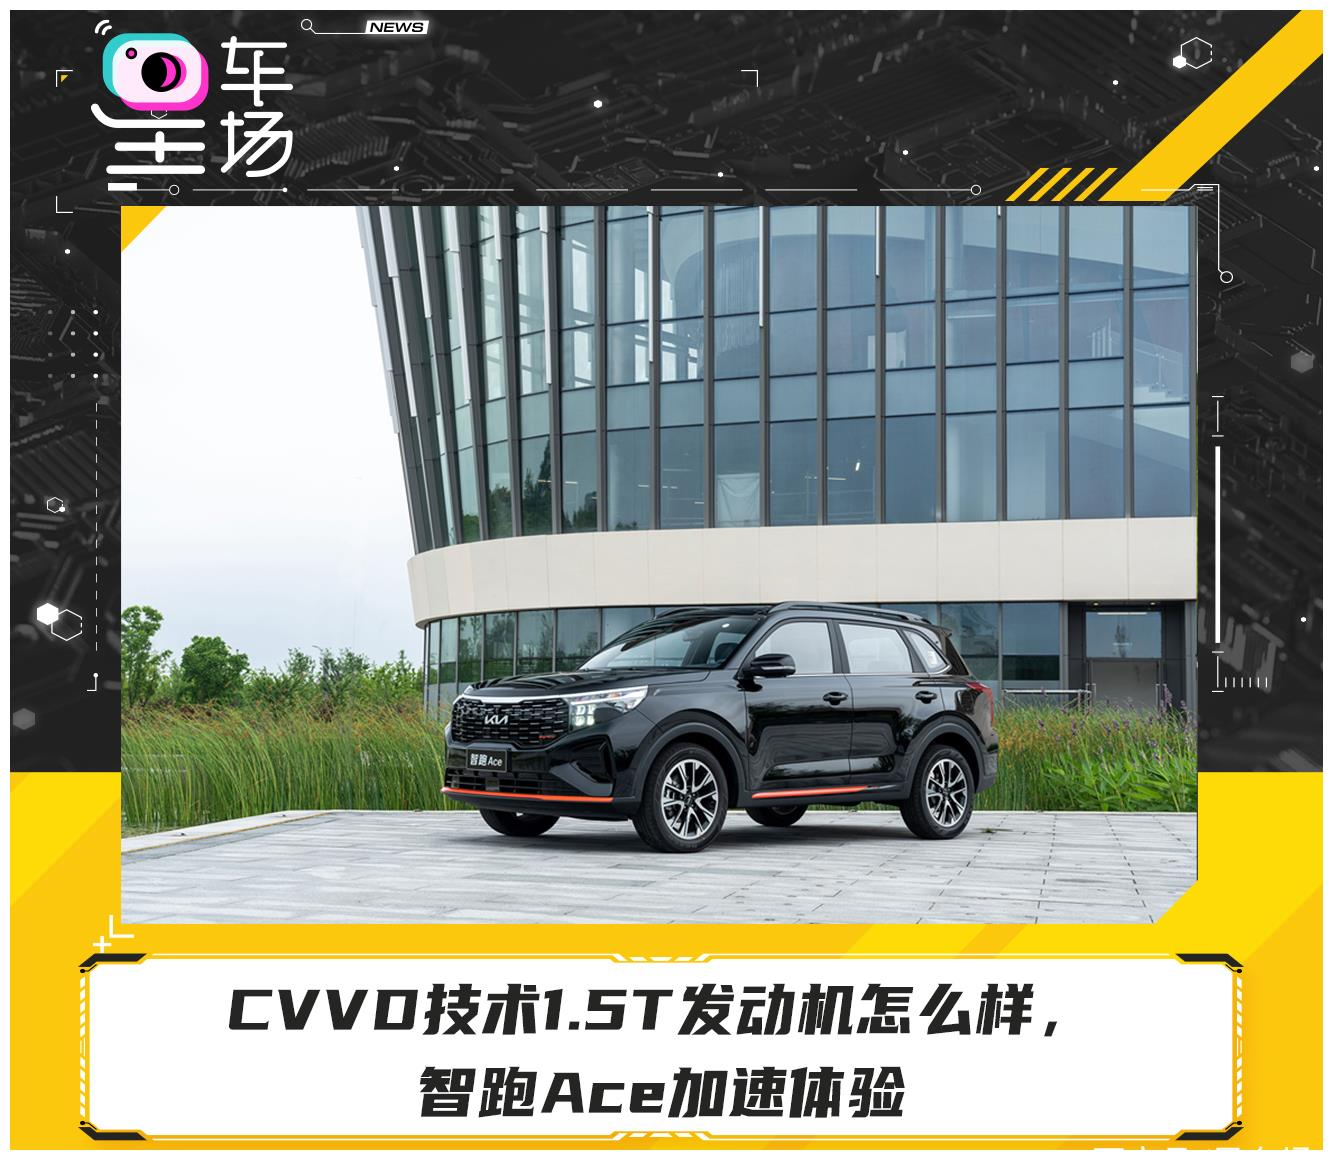 CVVD技术1.5T发动机怎么样,智跑Ace加速体验